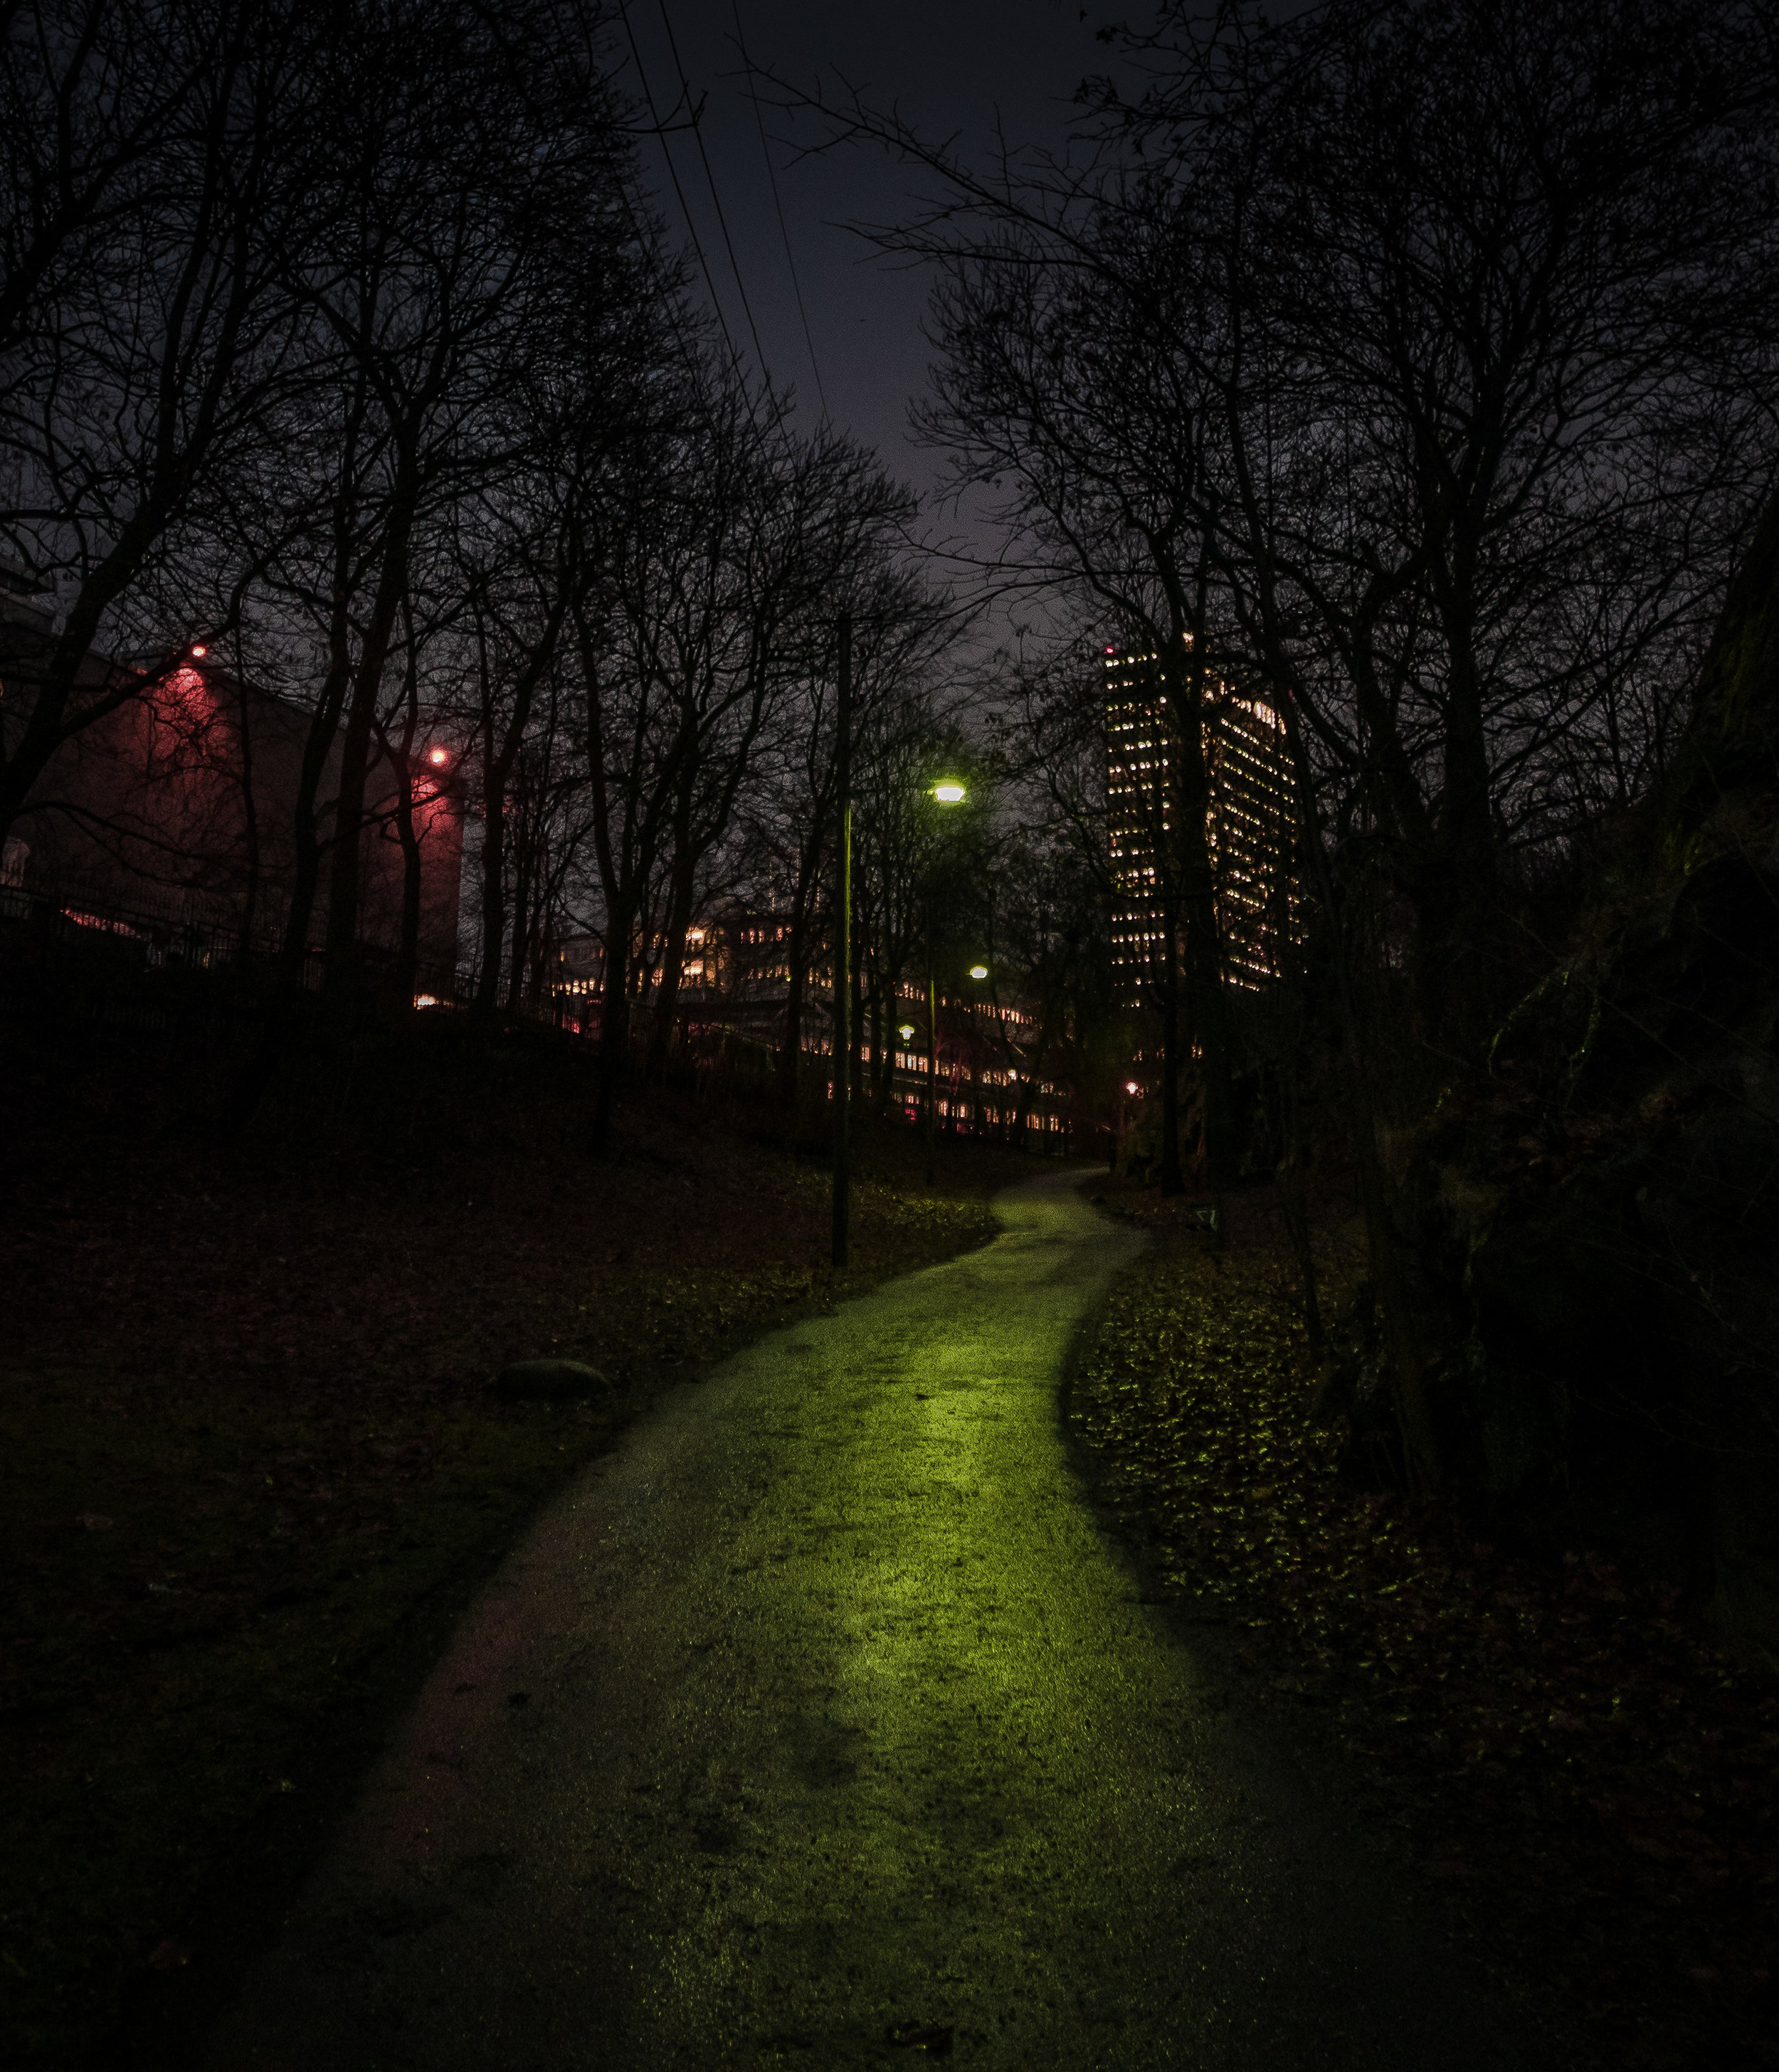 Mariebergsparken 20 december 2016. Foto: Nils Öhman